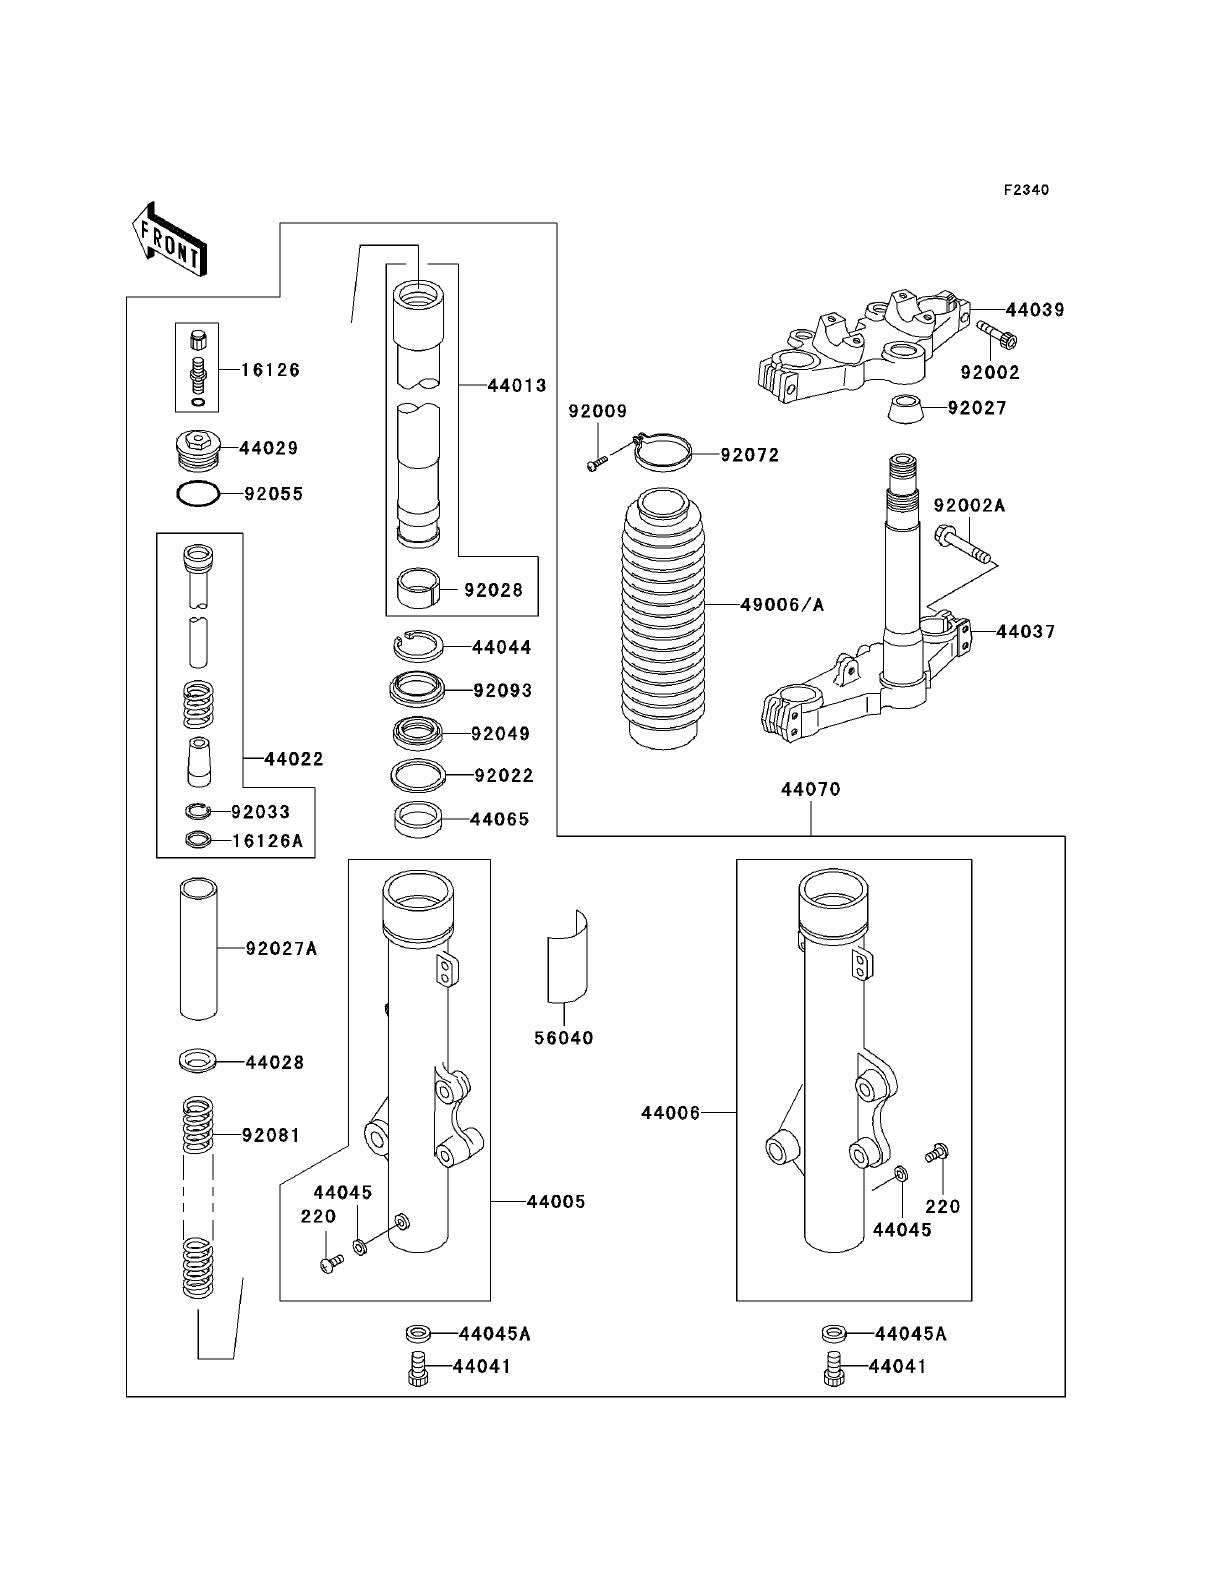 2009 Klr 650 Wiring Diagram Nailor Vav Kawasaki Fuel Filter Get Free Image About